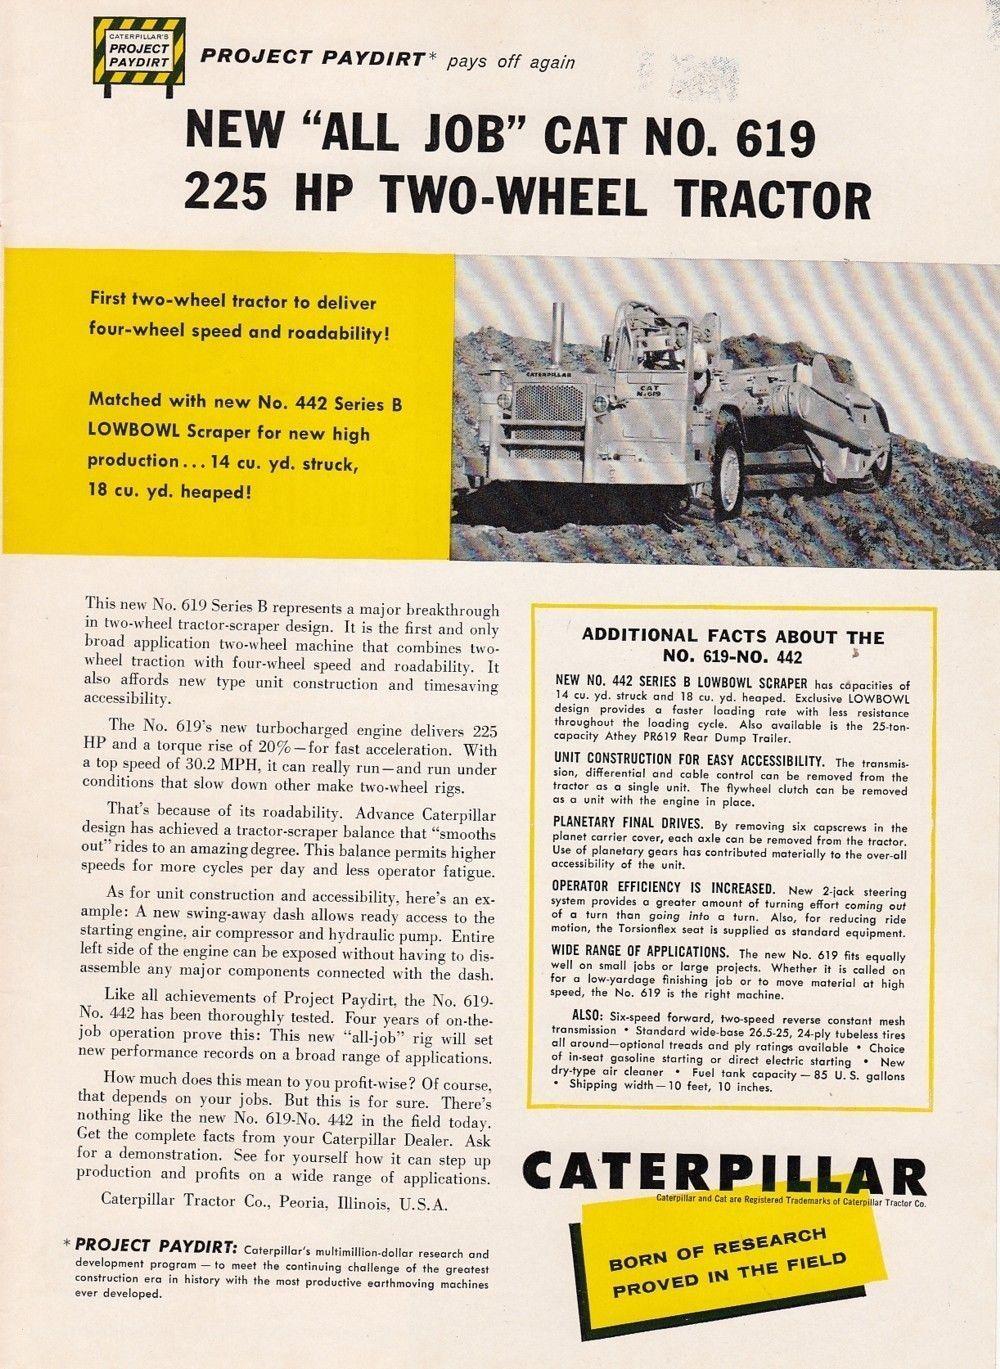 1959 Caterpillar Tractor Co Peoria IL Ad Cat No 619 Two Wheel ...